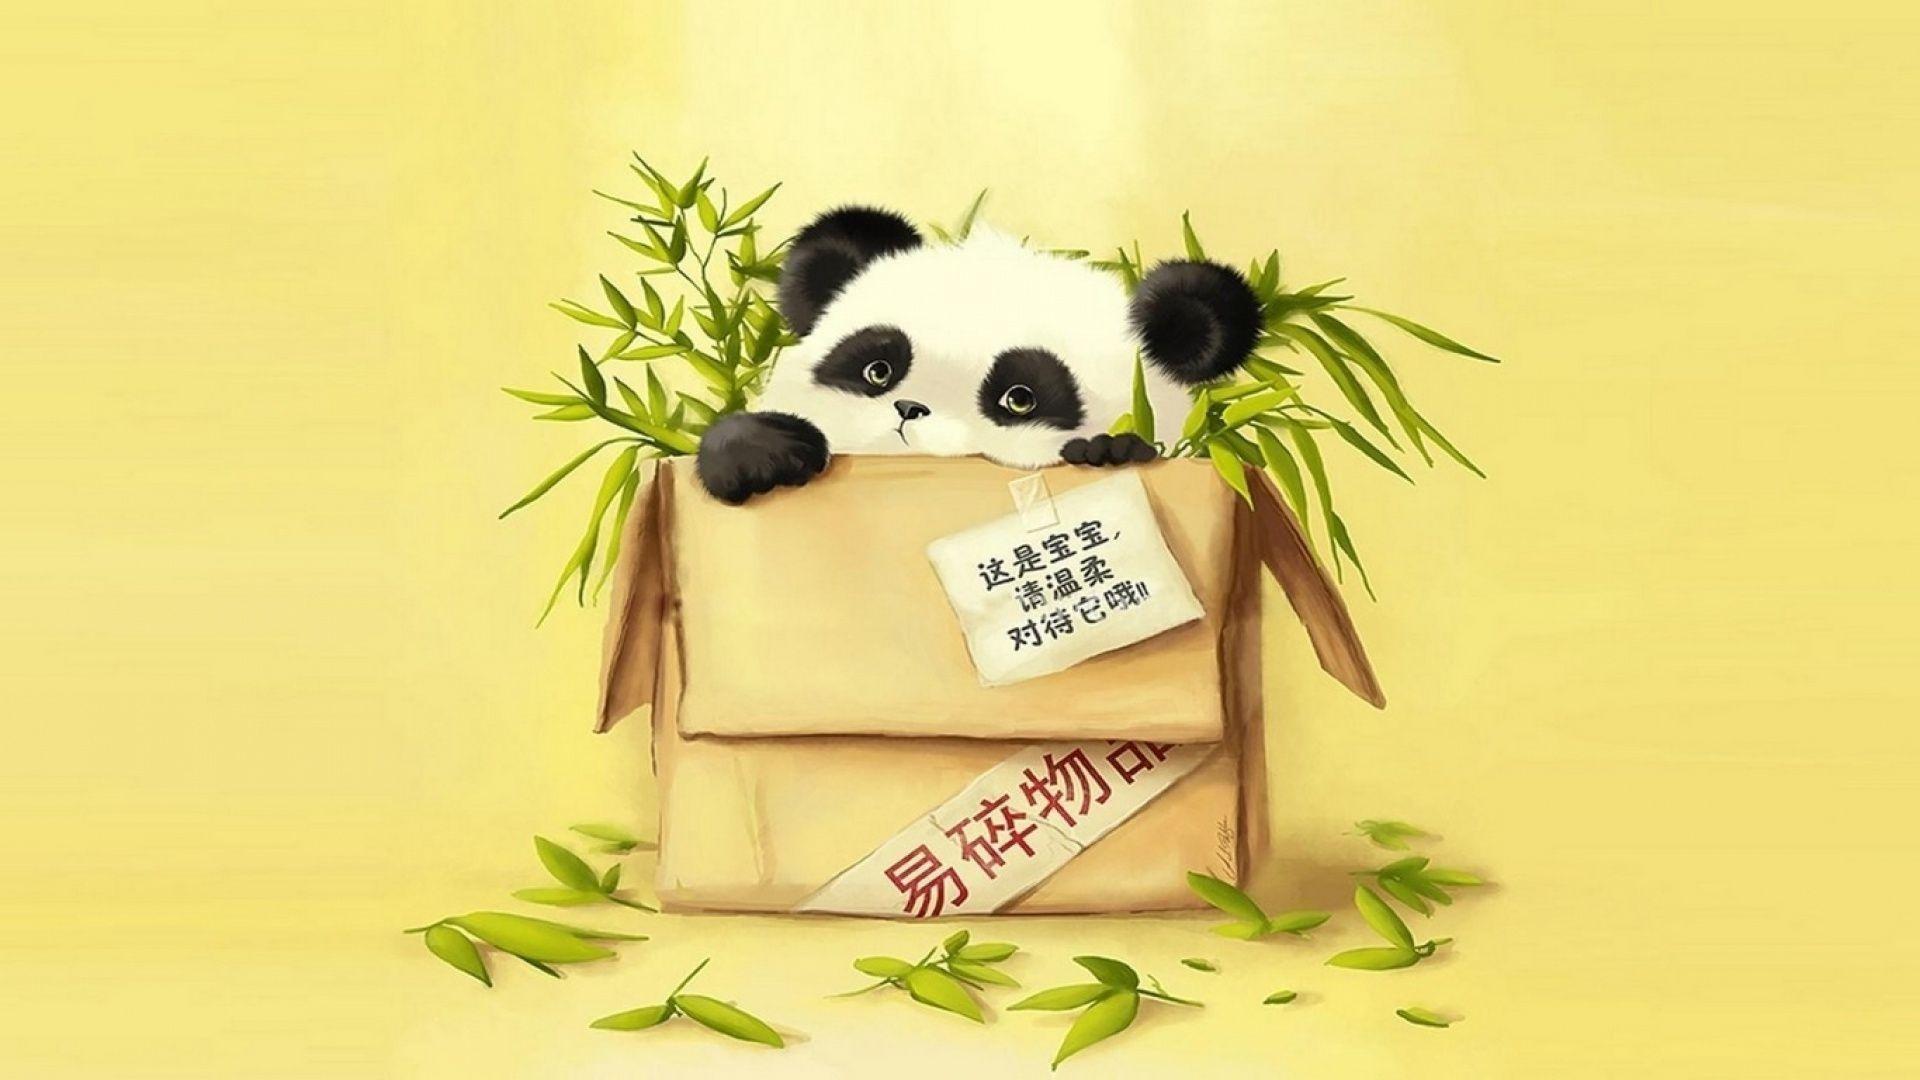 Wallpapers For > Cute Cartoon Panda Wallpaper